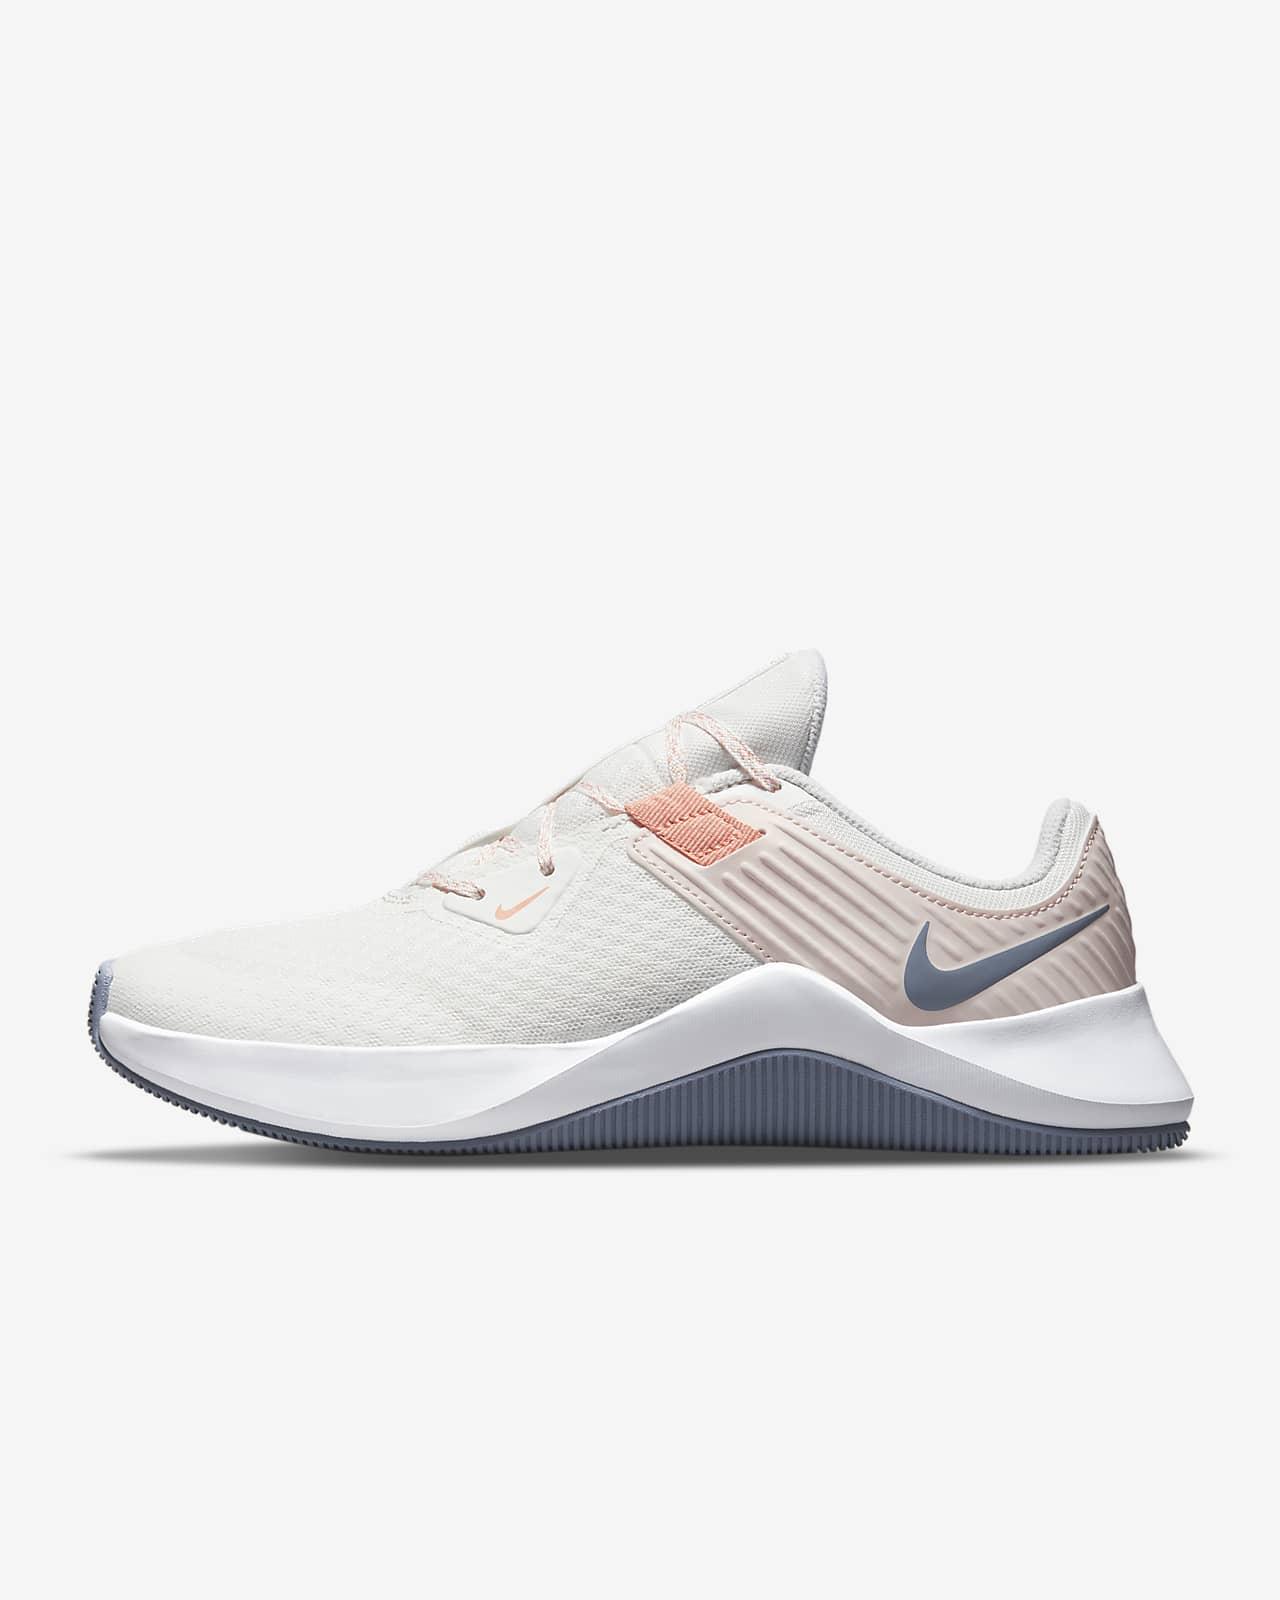 Nike MC Trainer Women's Training Shoe